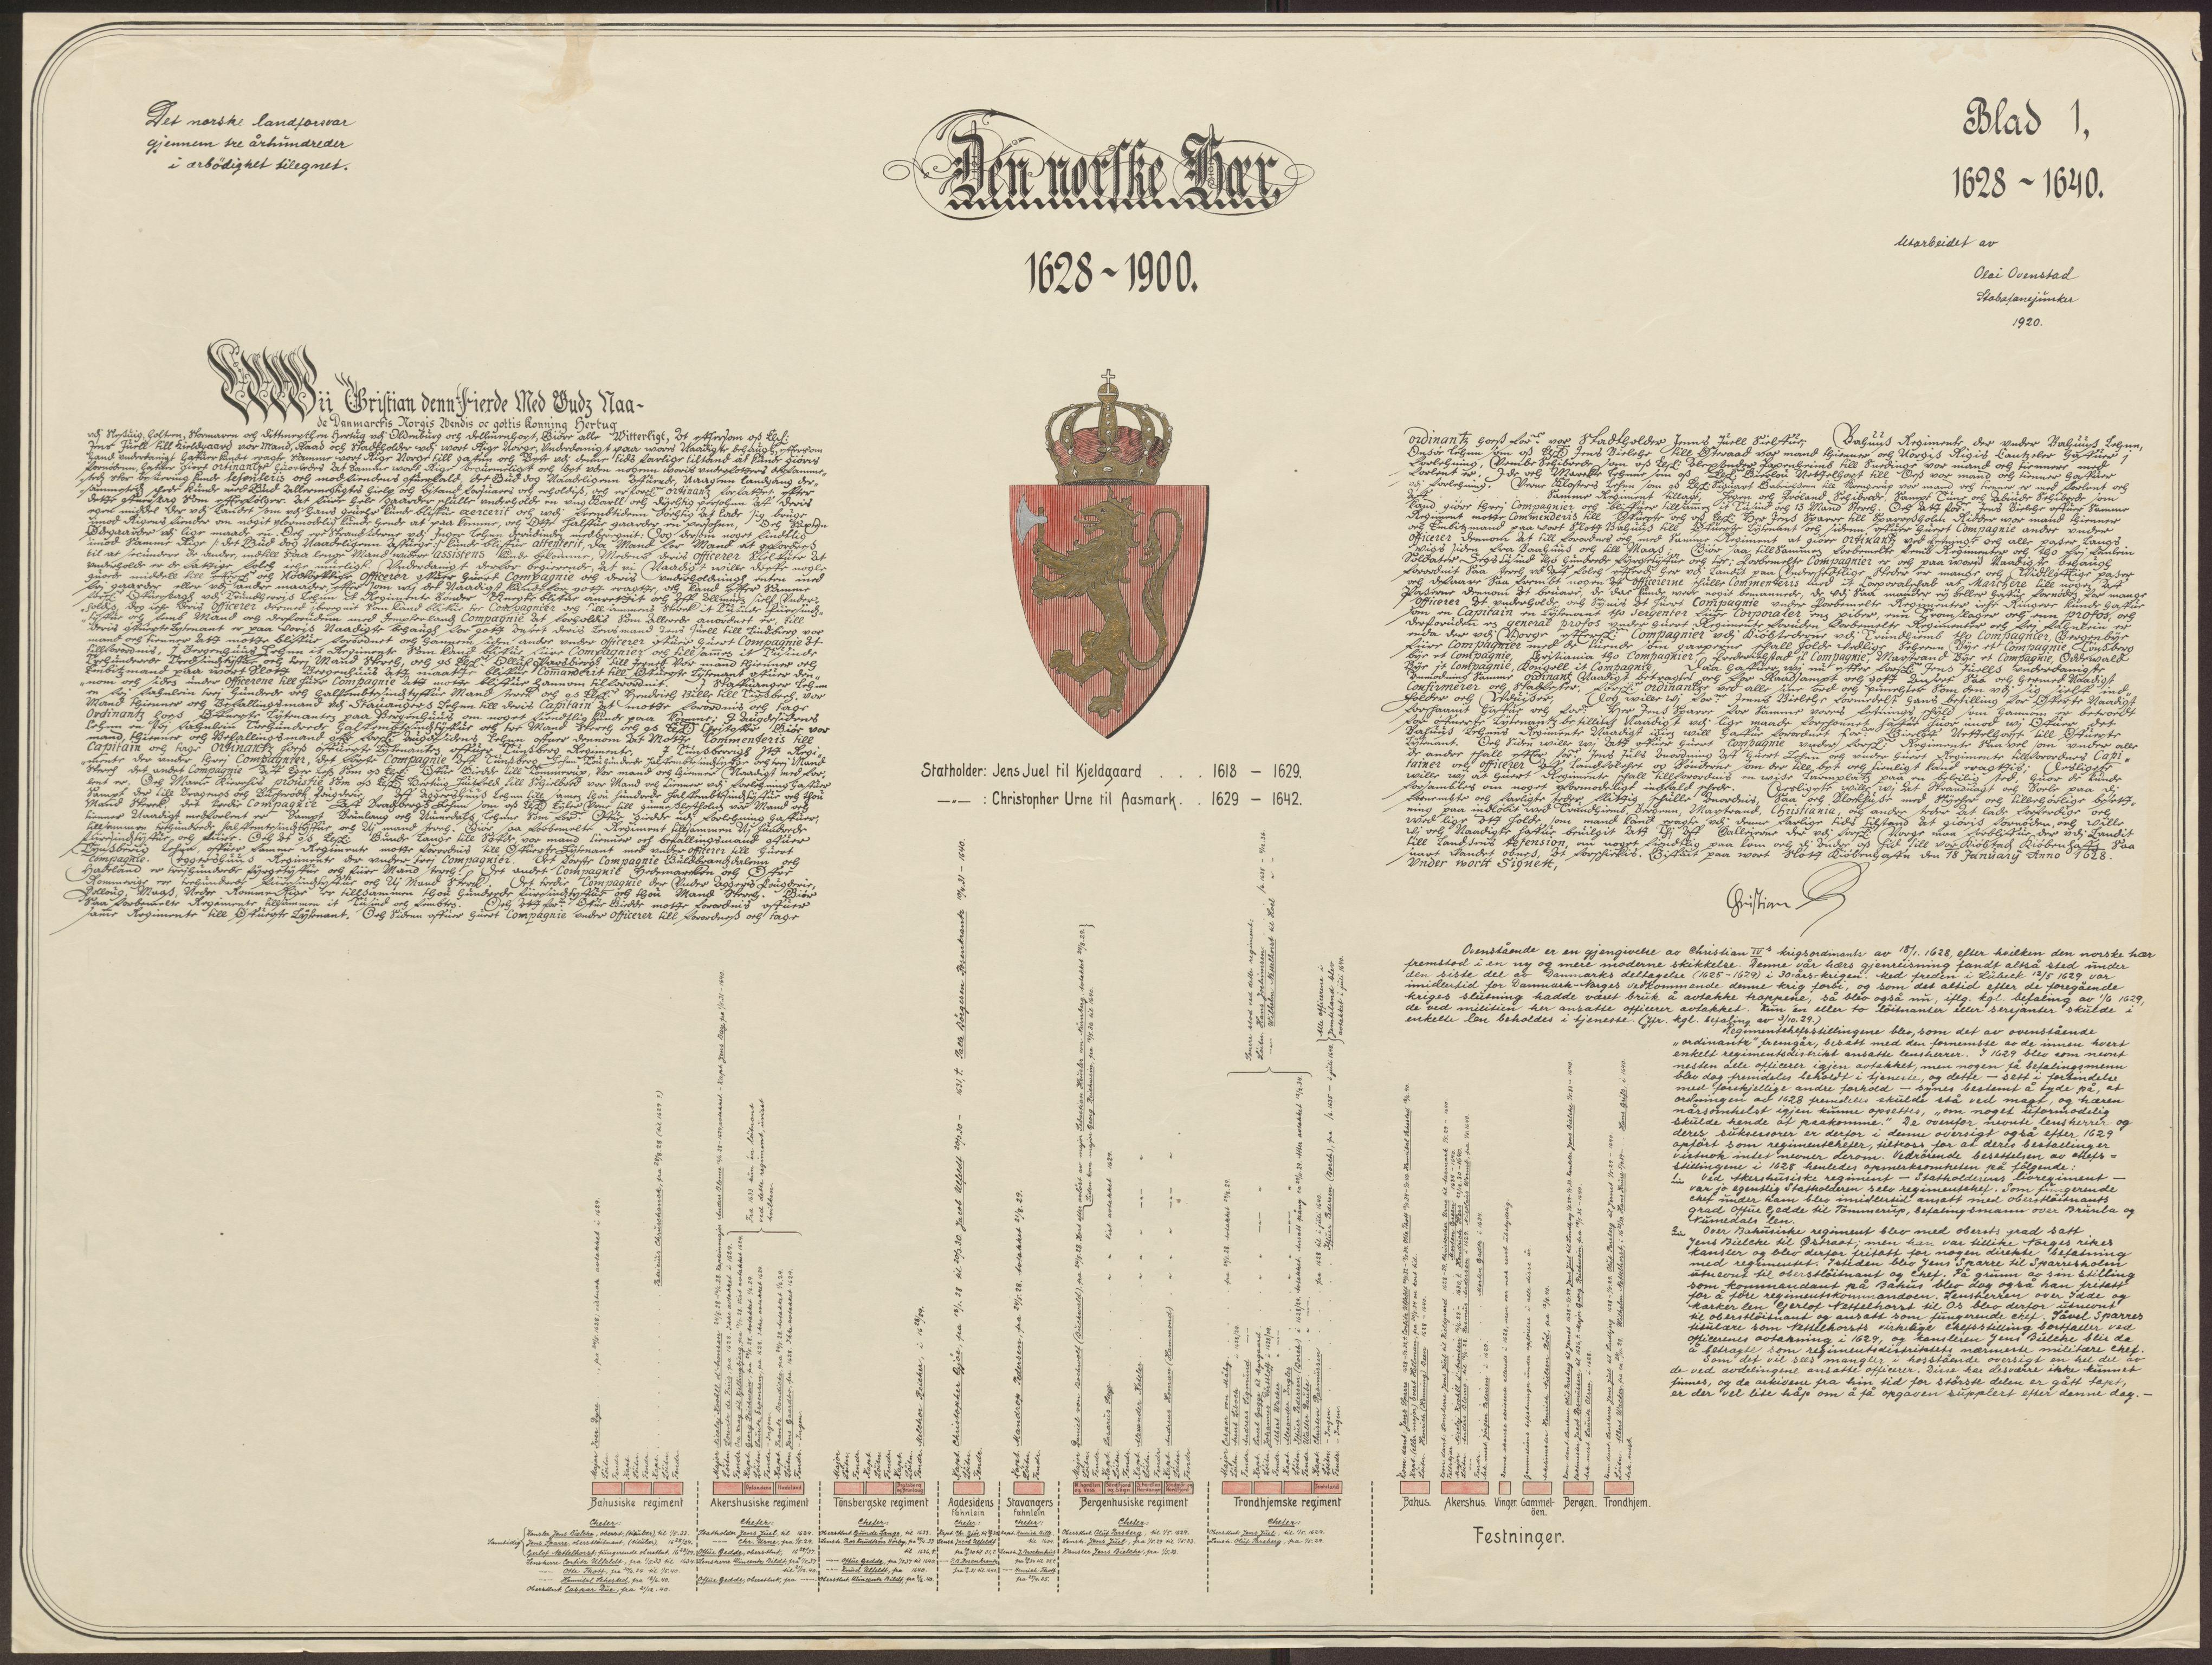 RA, Riksarkivets bibliotek, 1628-1818, s. 1